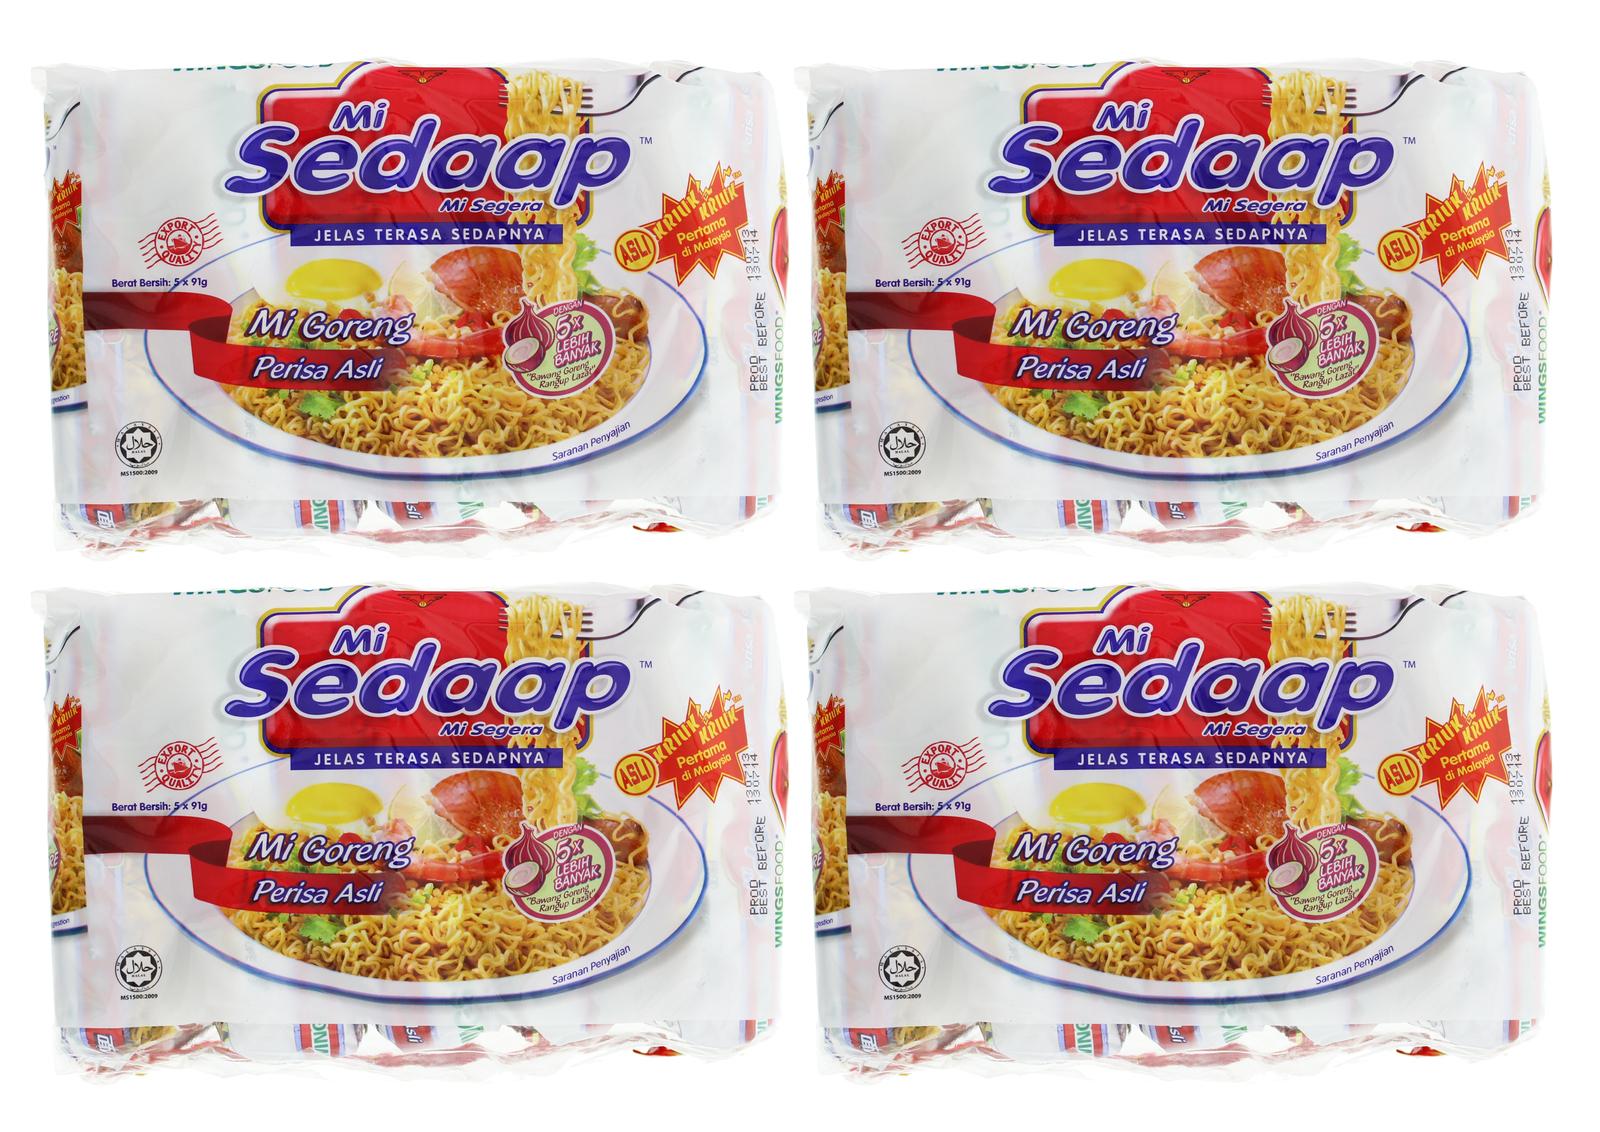 Mi Sedaap Perisa Asli Instant Noodles 88g (40 Pack) image